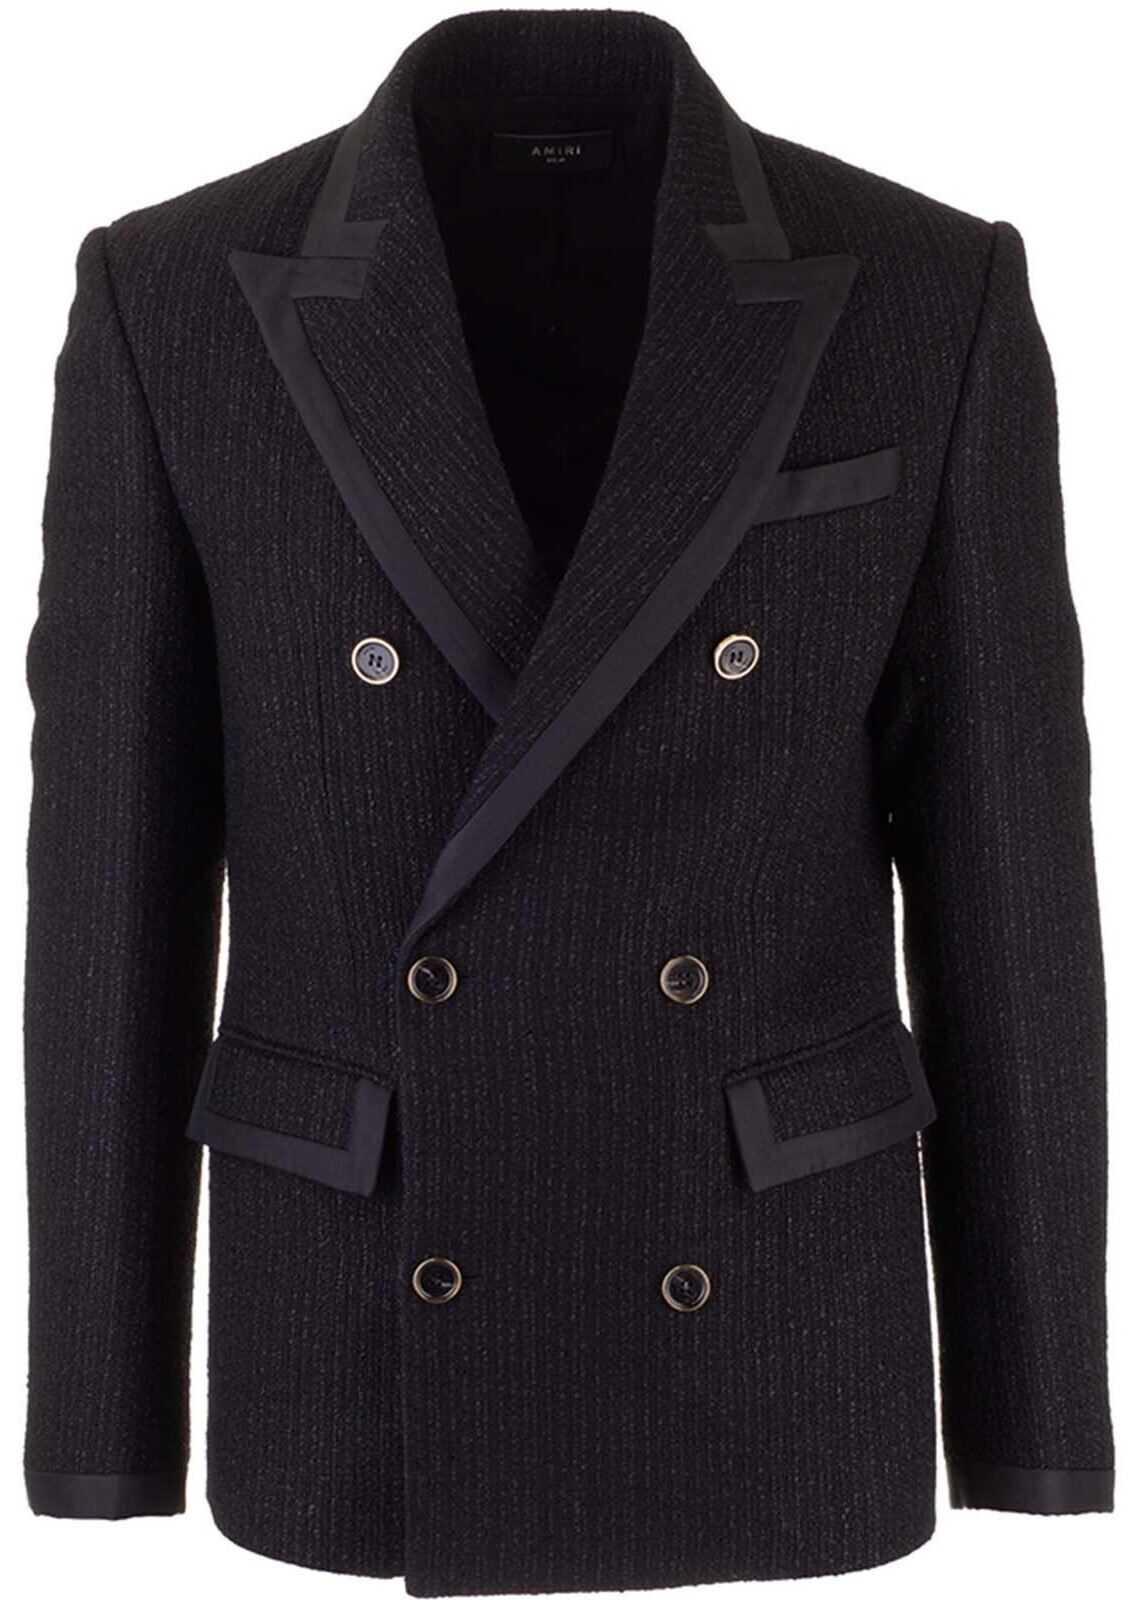 AMIRI Double-Breasted Jacket In Black Black imagine